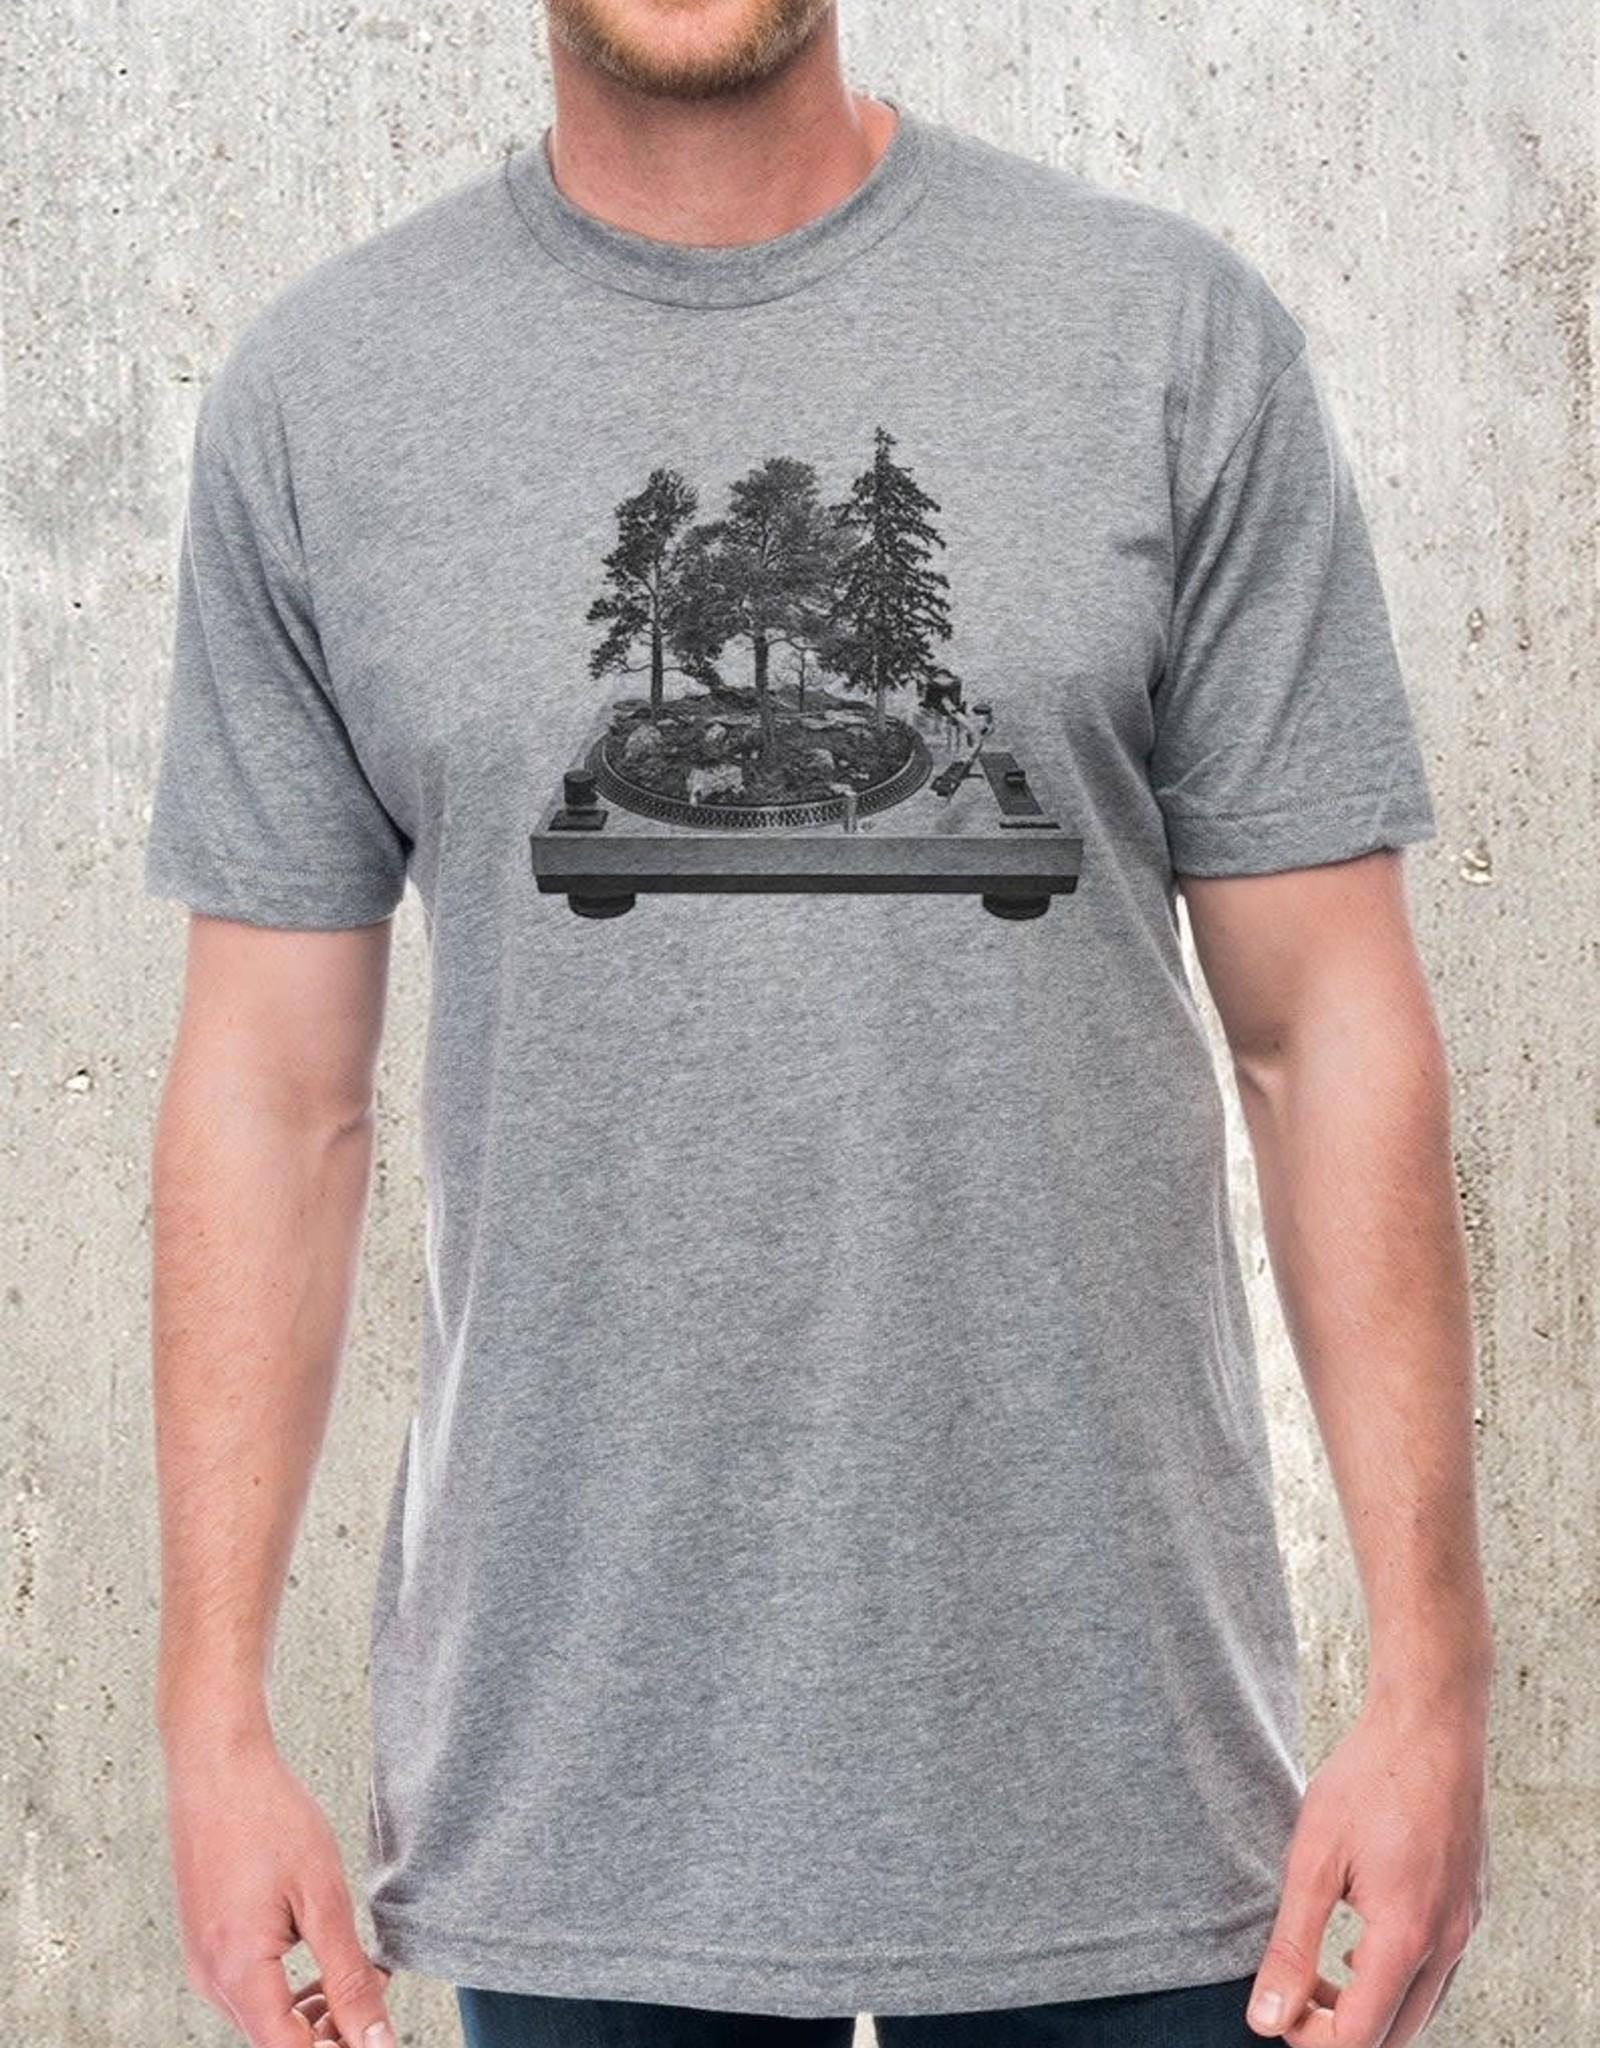 Black Lantern Black Lantern - T-shirt - Turntable Forest